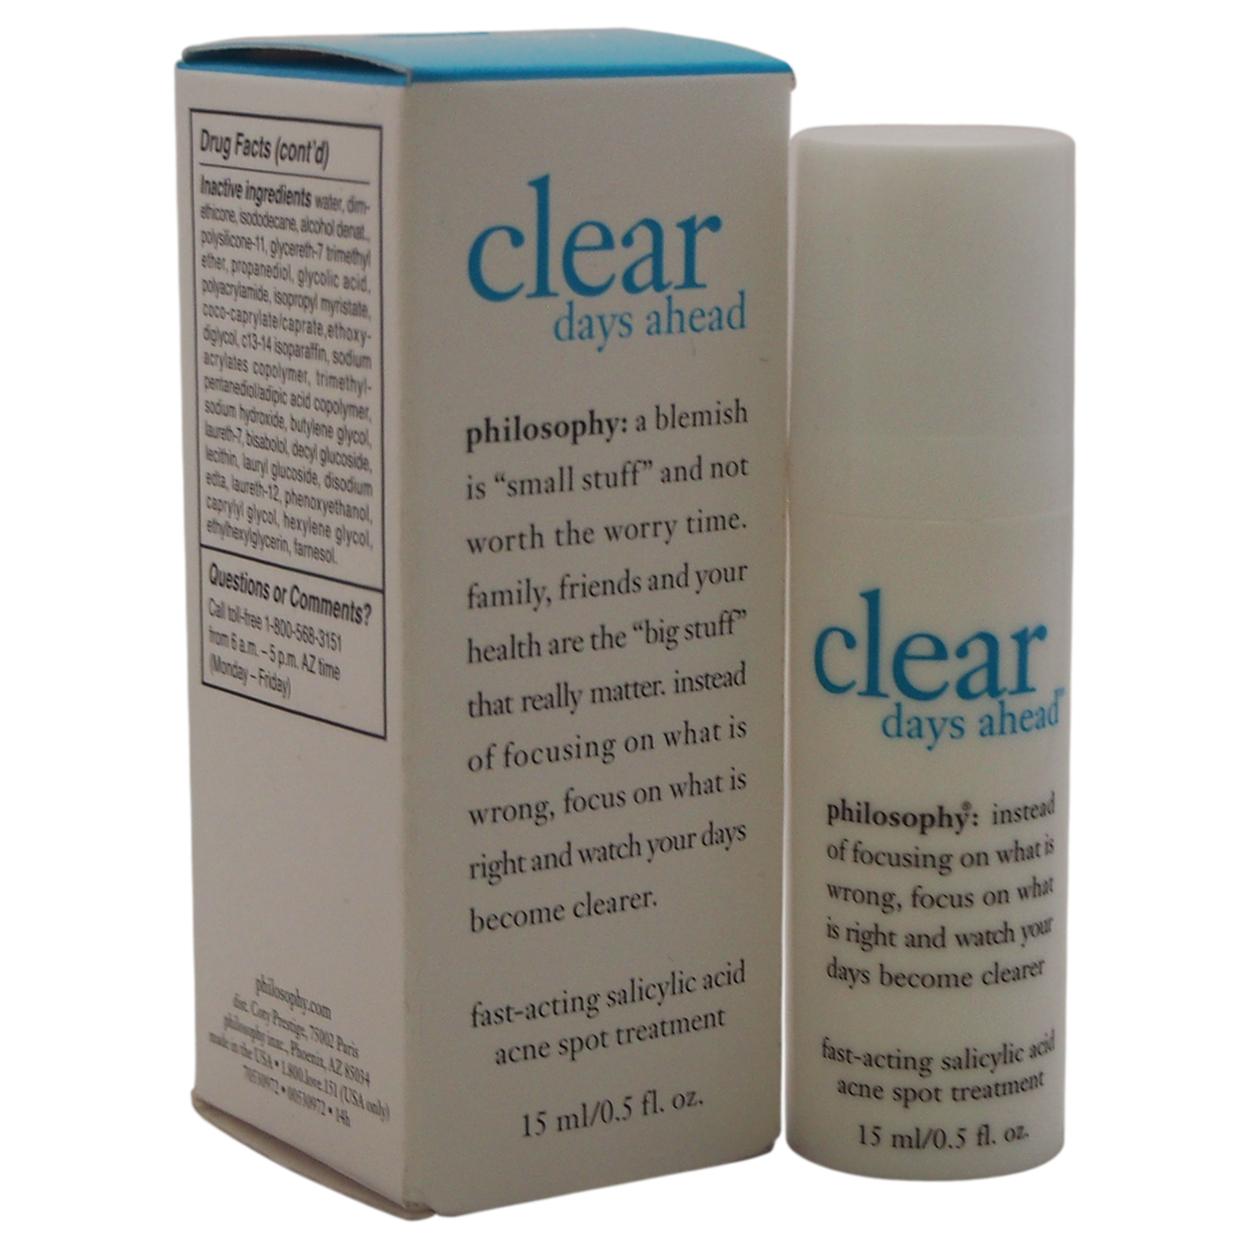 Clear Days Ahead Acne Spot Treatment By Philosophy For Unisex 0.5 Oz Treatment